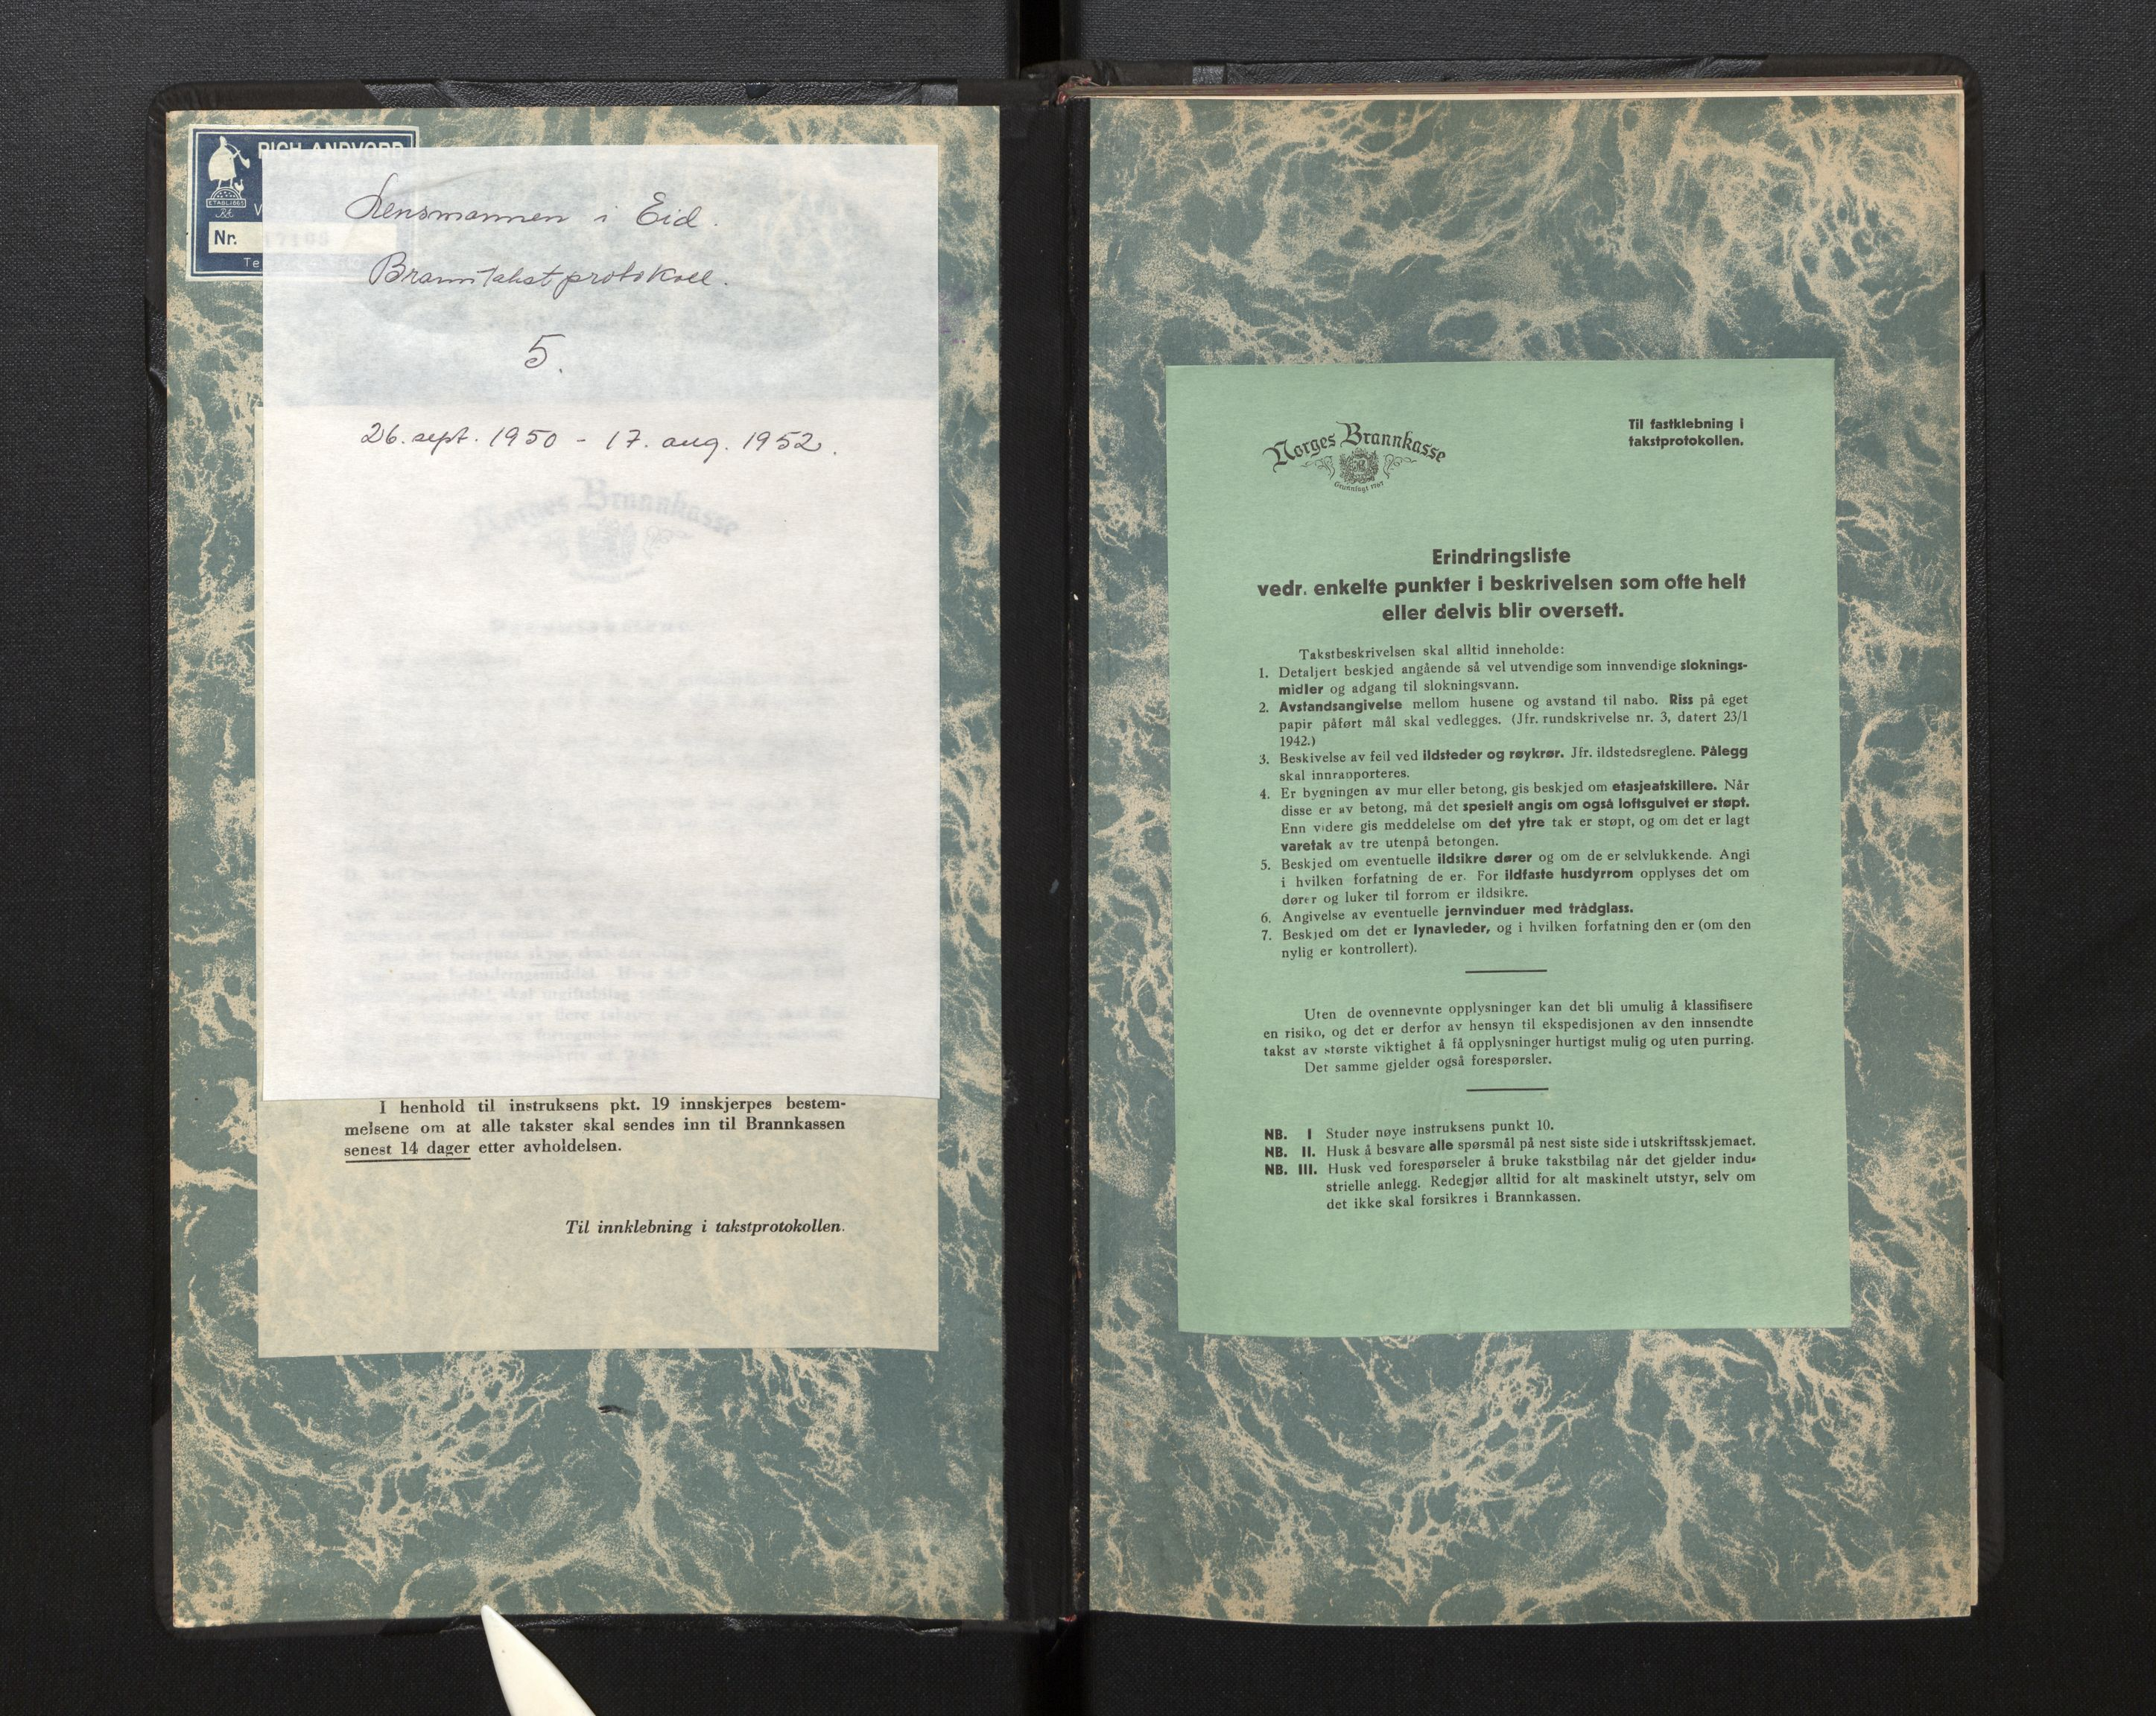 SAB, Lensmannen i Eid, 0012/L0005: Branntakstprotokoll, 1950-1952